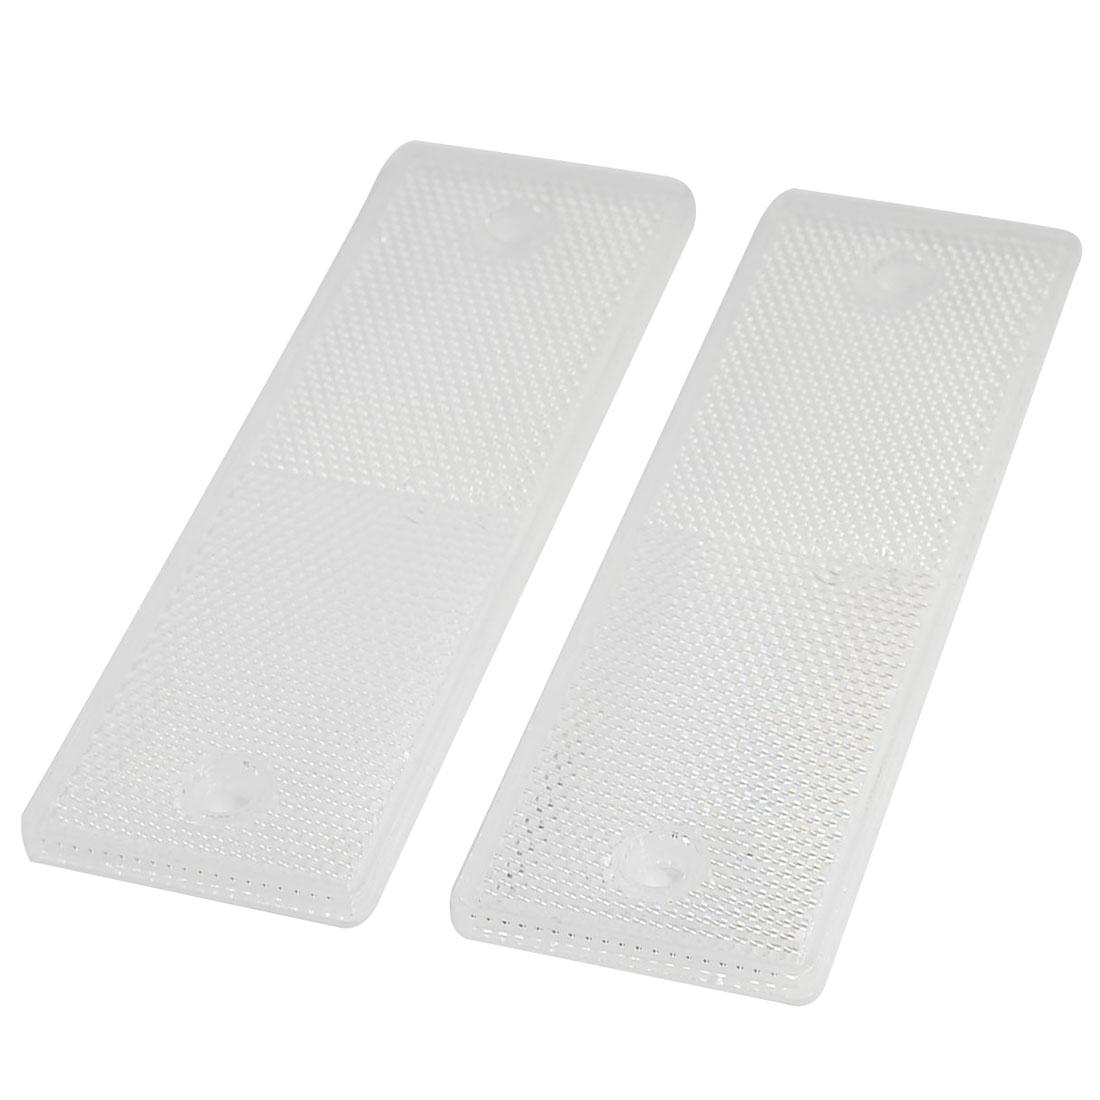 Car Auto Rectangle Safety Brake Reflector Caution Warning Plate White 2PCS